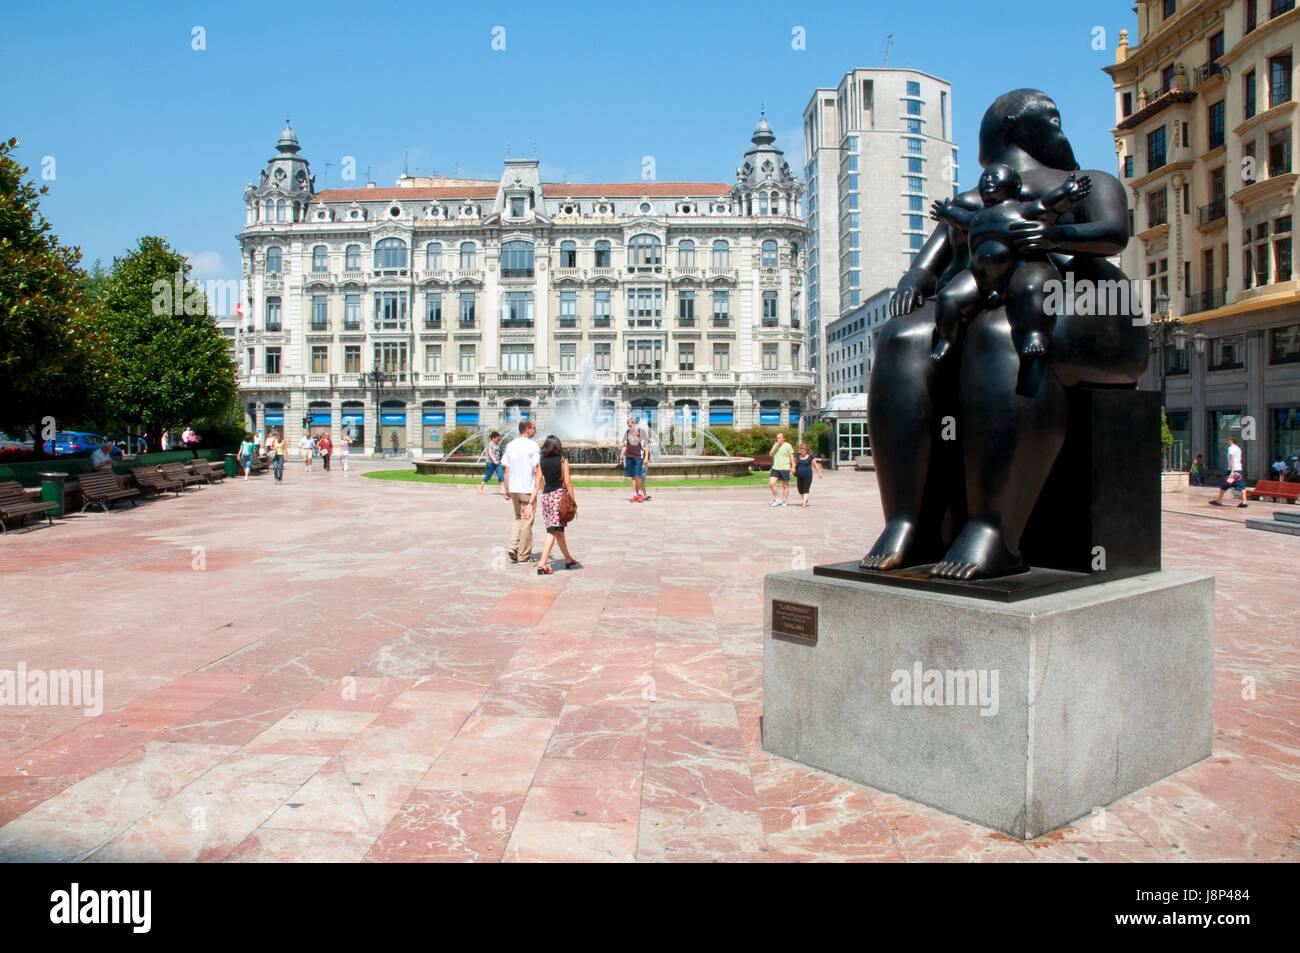 La maternité, par Fernando Botero. Escandalera Square, Oviedo, Espagne. Photo Stock